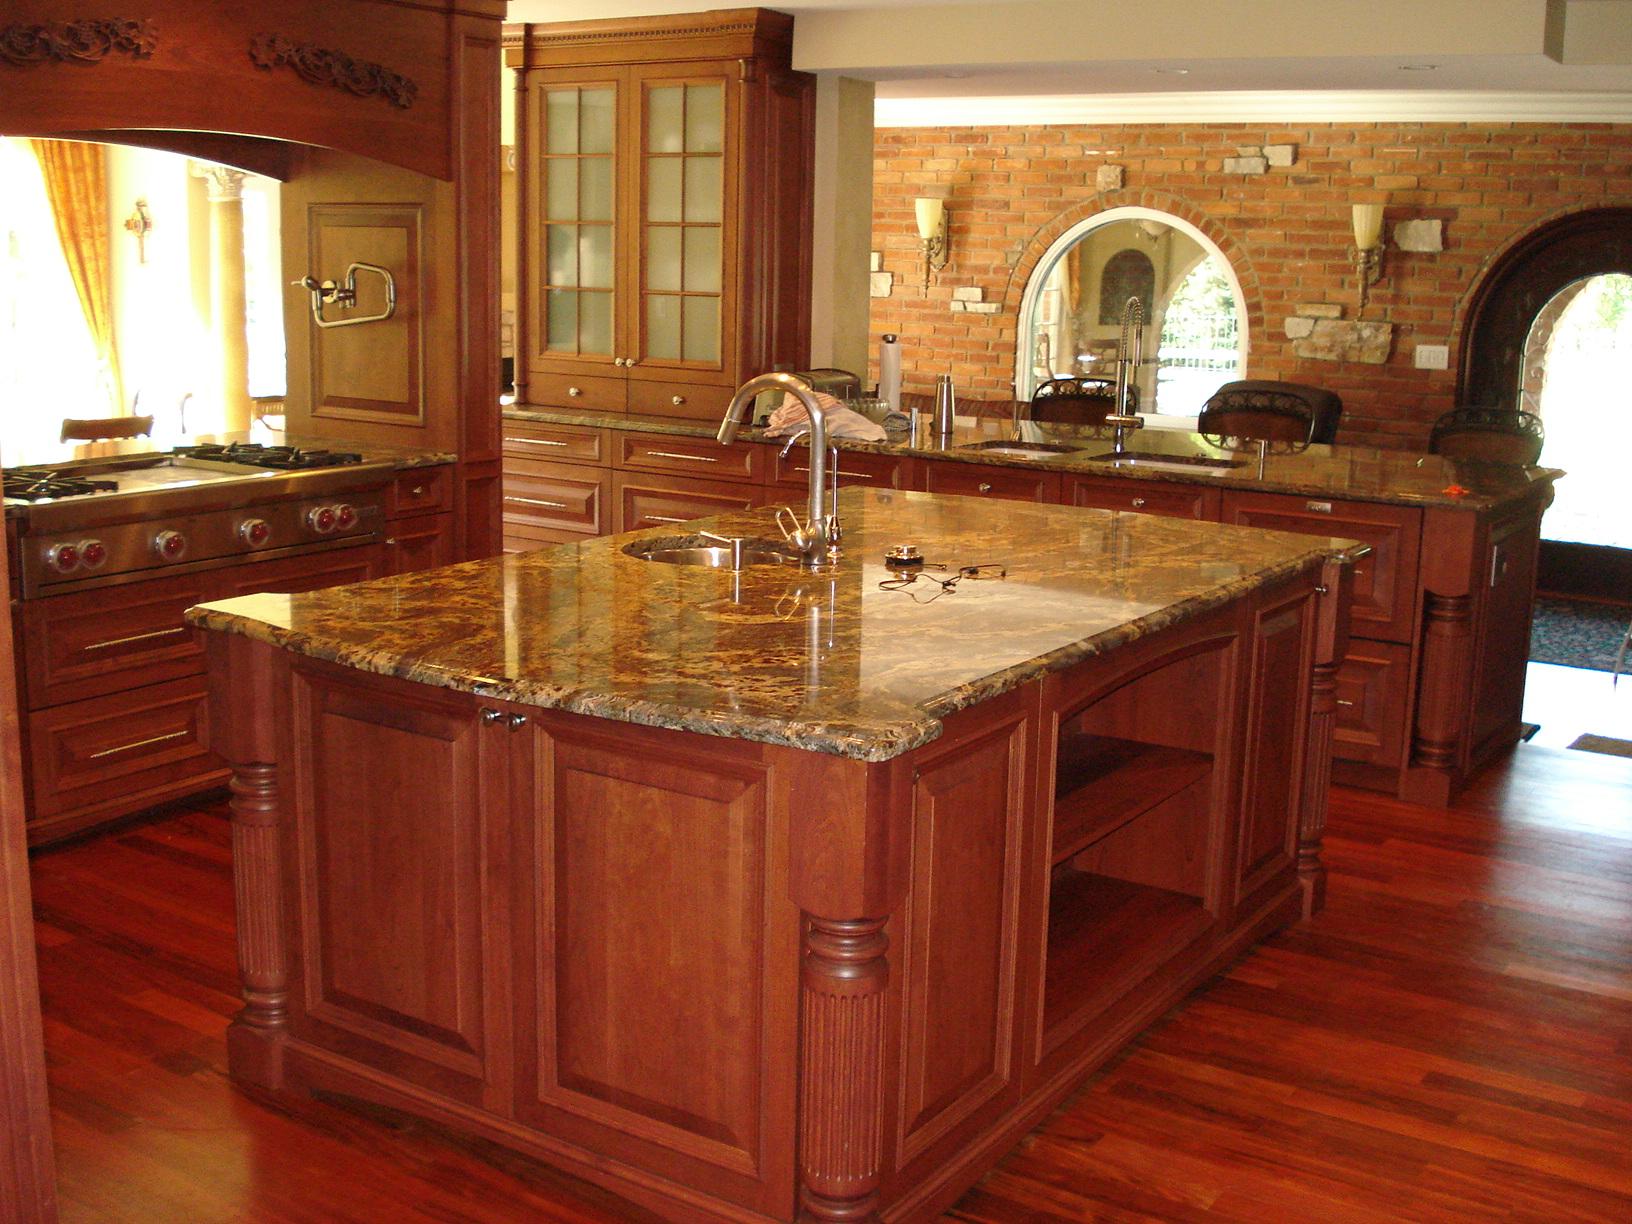 Faux marble kitchen table set photo - 1